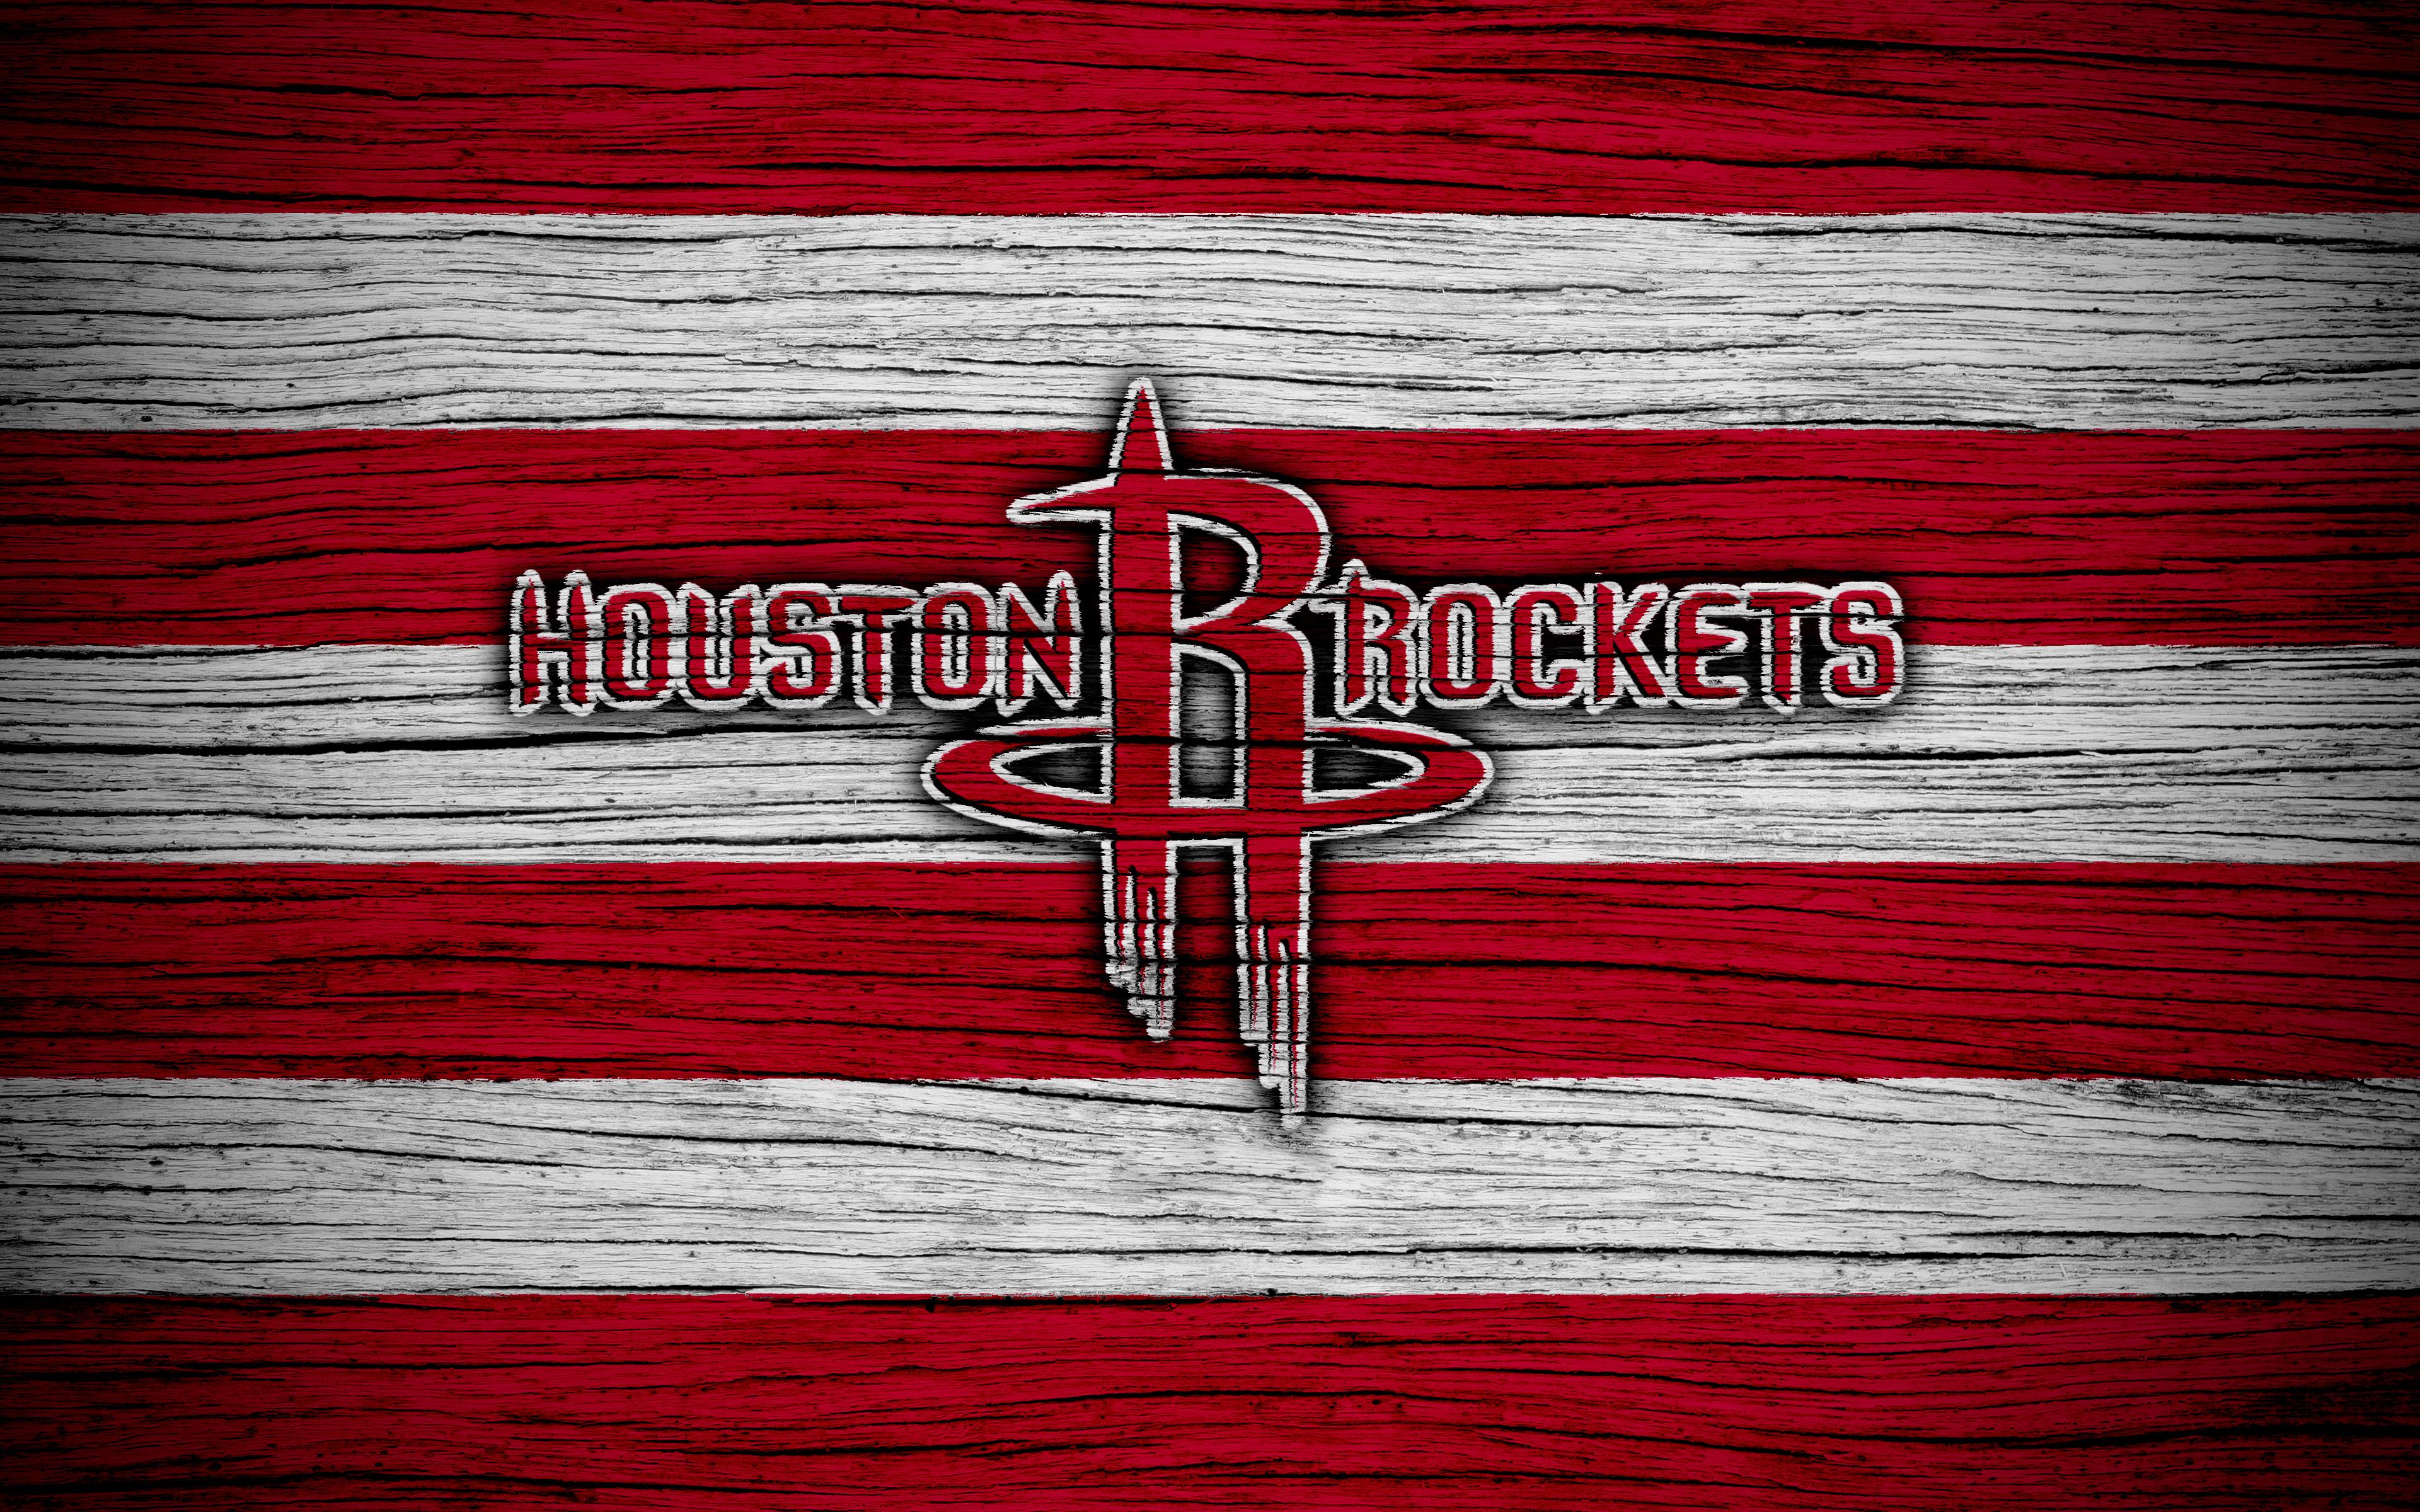 Houston Rockets 4k Ultra HD Wallpaper | Background Image | 3840x2400 | ID:986051 - Wallpaper Abyss